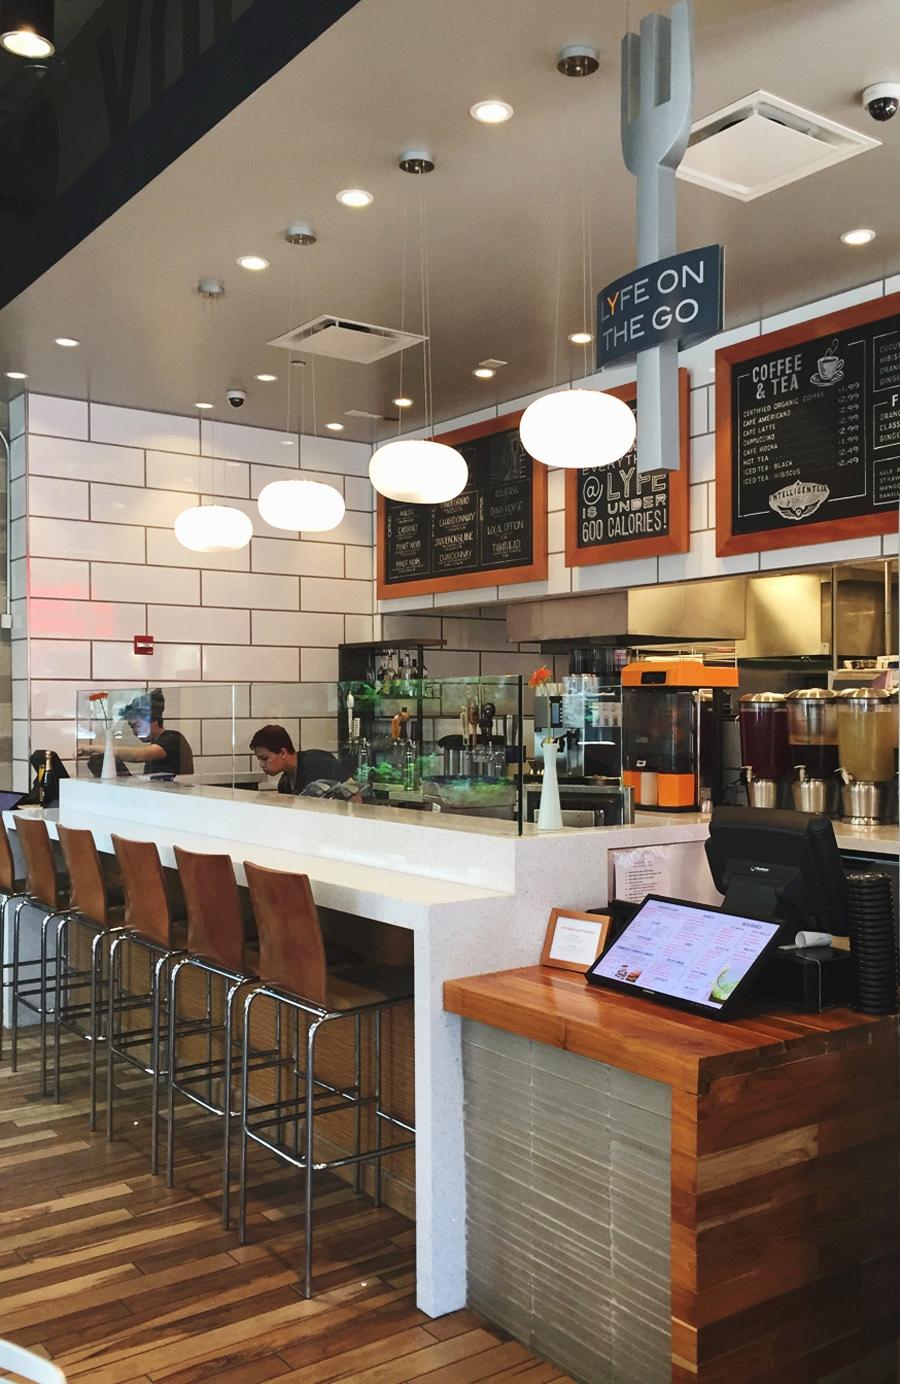 lyfe-kitchen-chicago-review.jpg